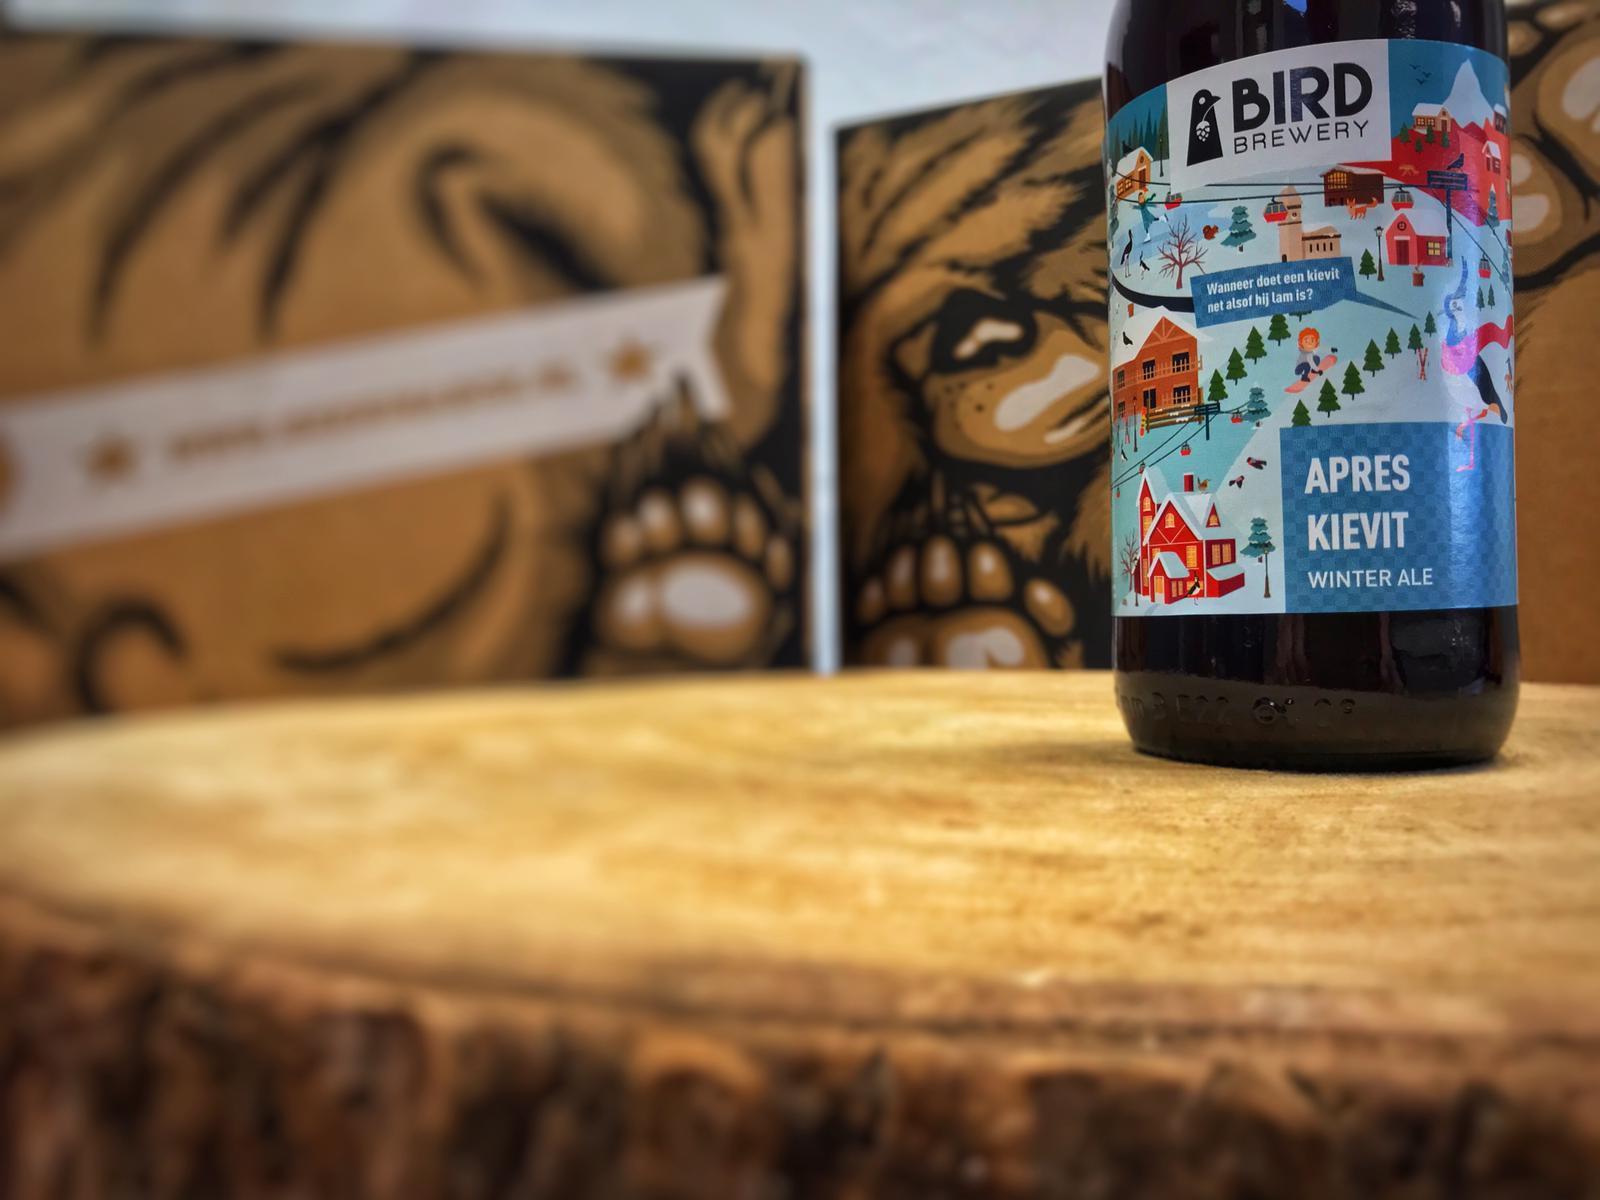 Apres Kievit van Bird Brewery